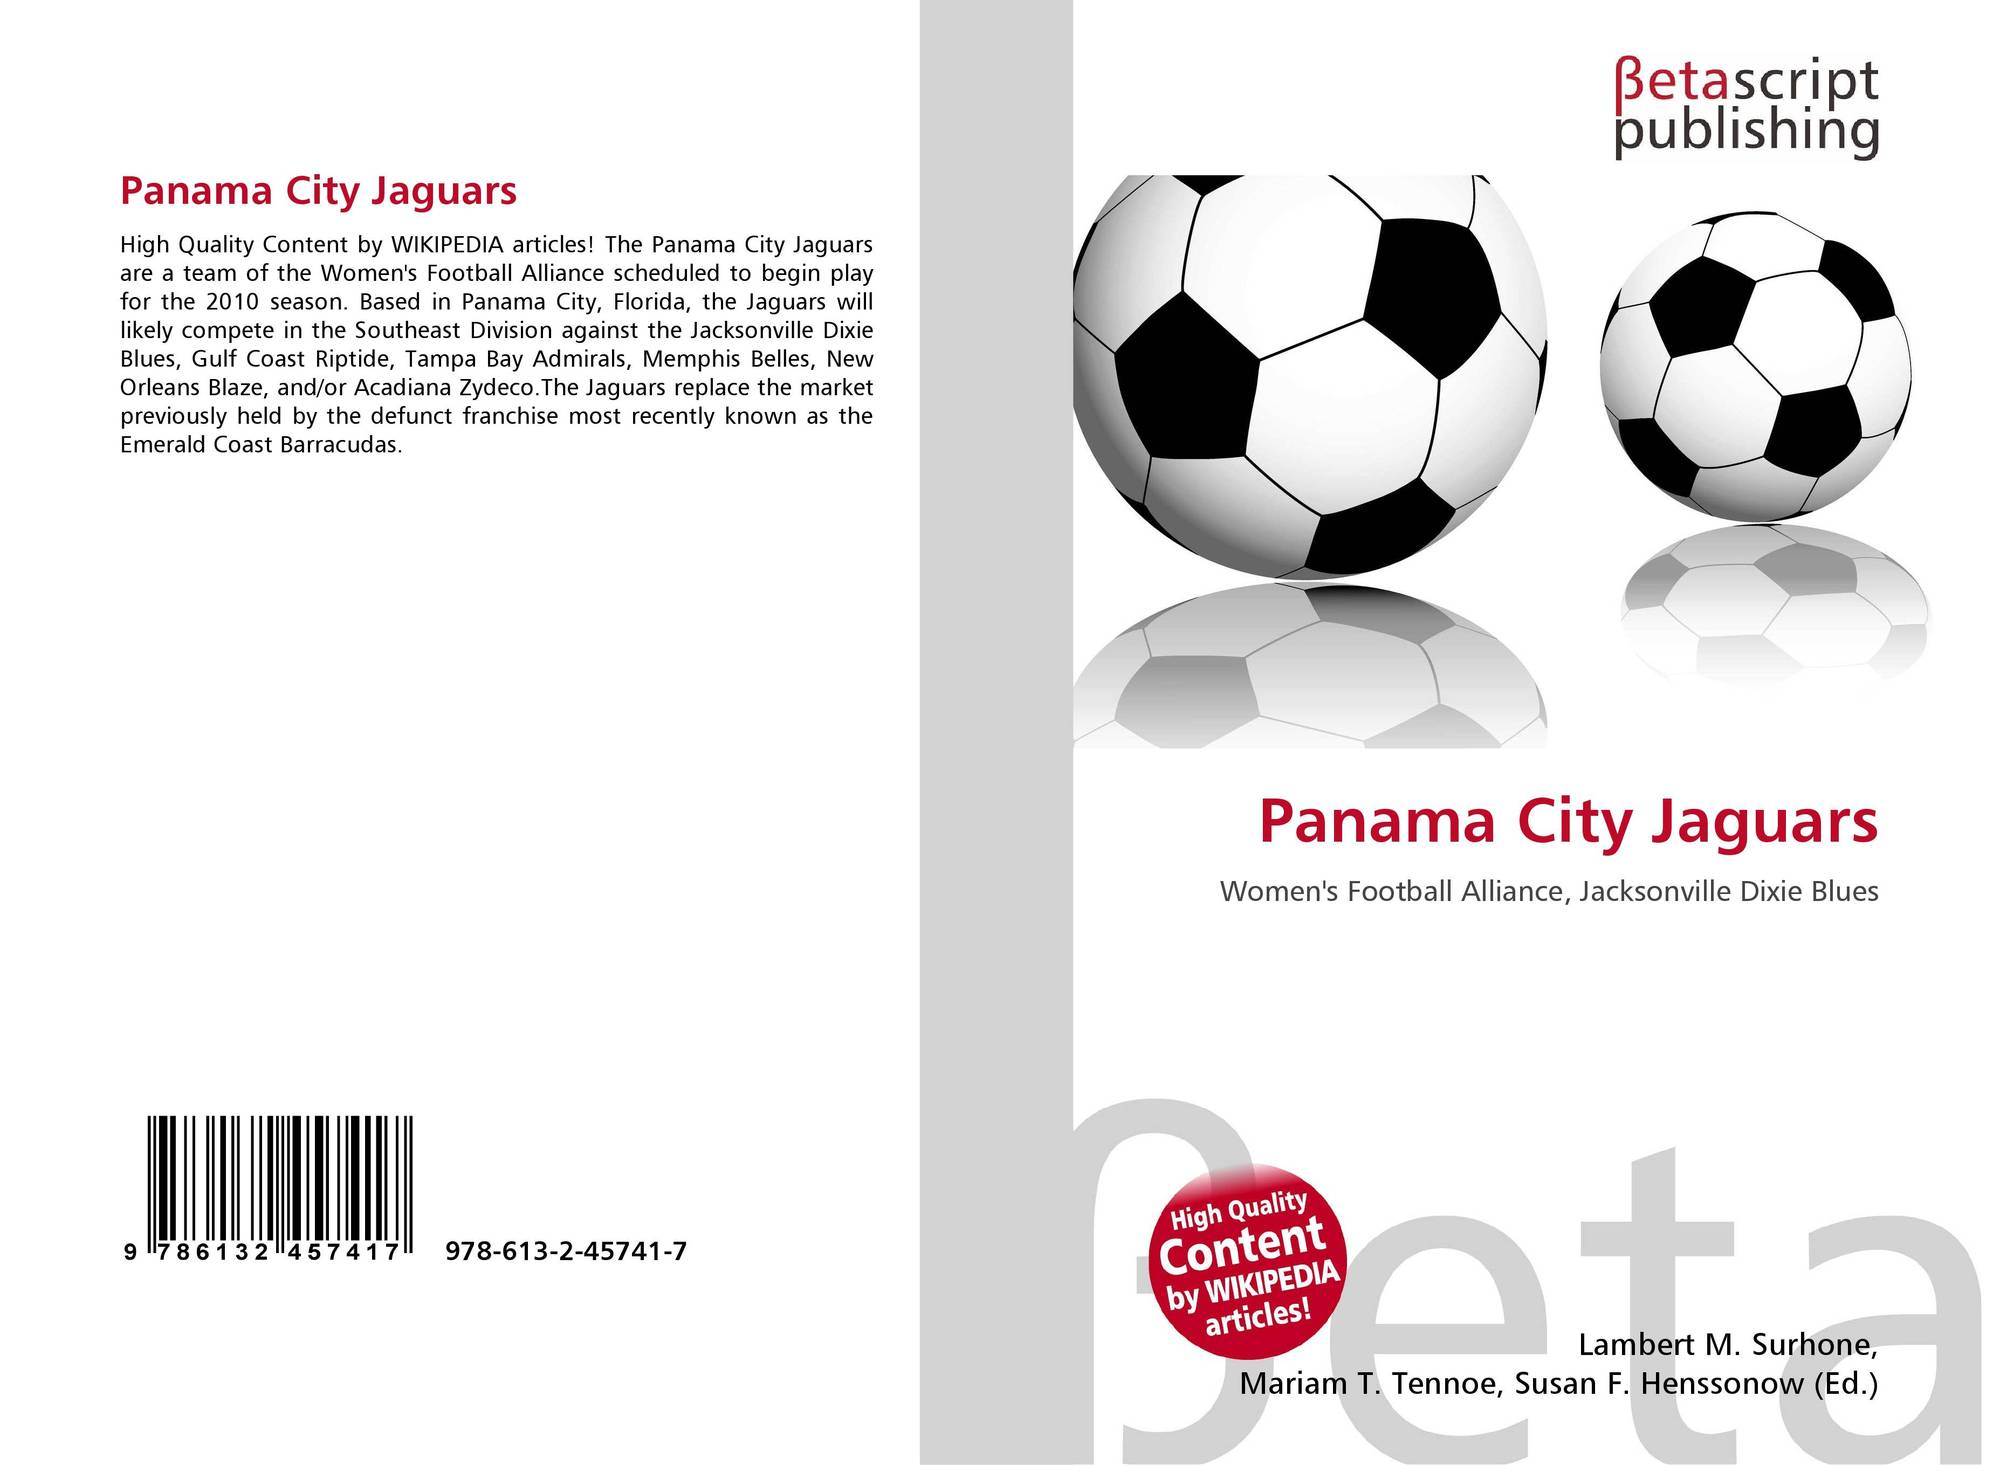 Panama City Jaguars 978 613 2 45741 7 6132457410 9786132457417